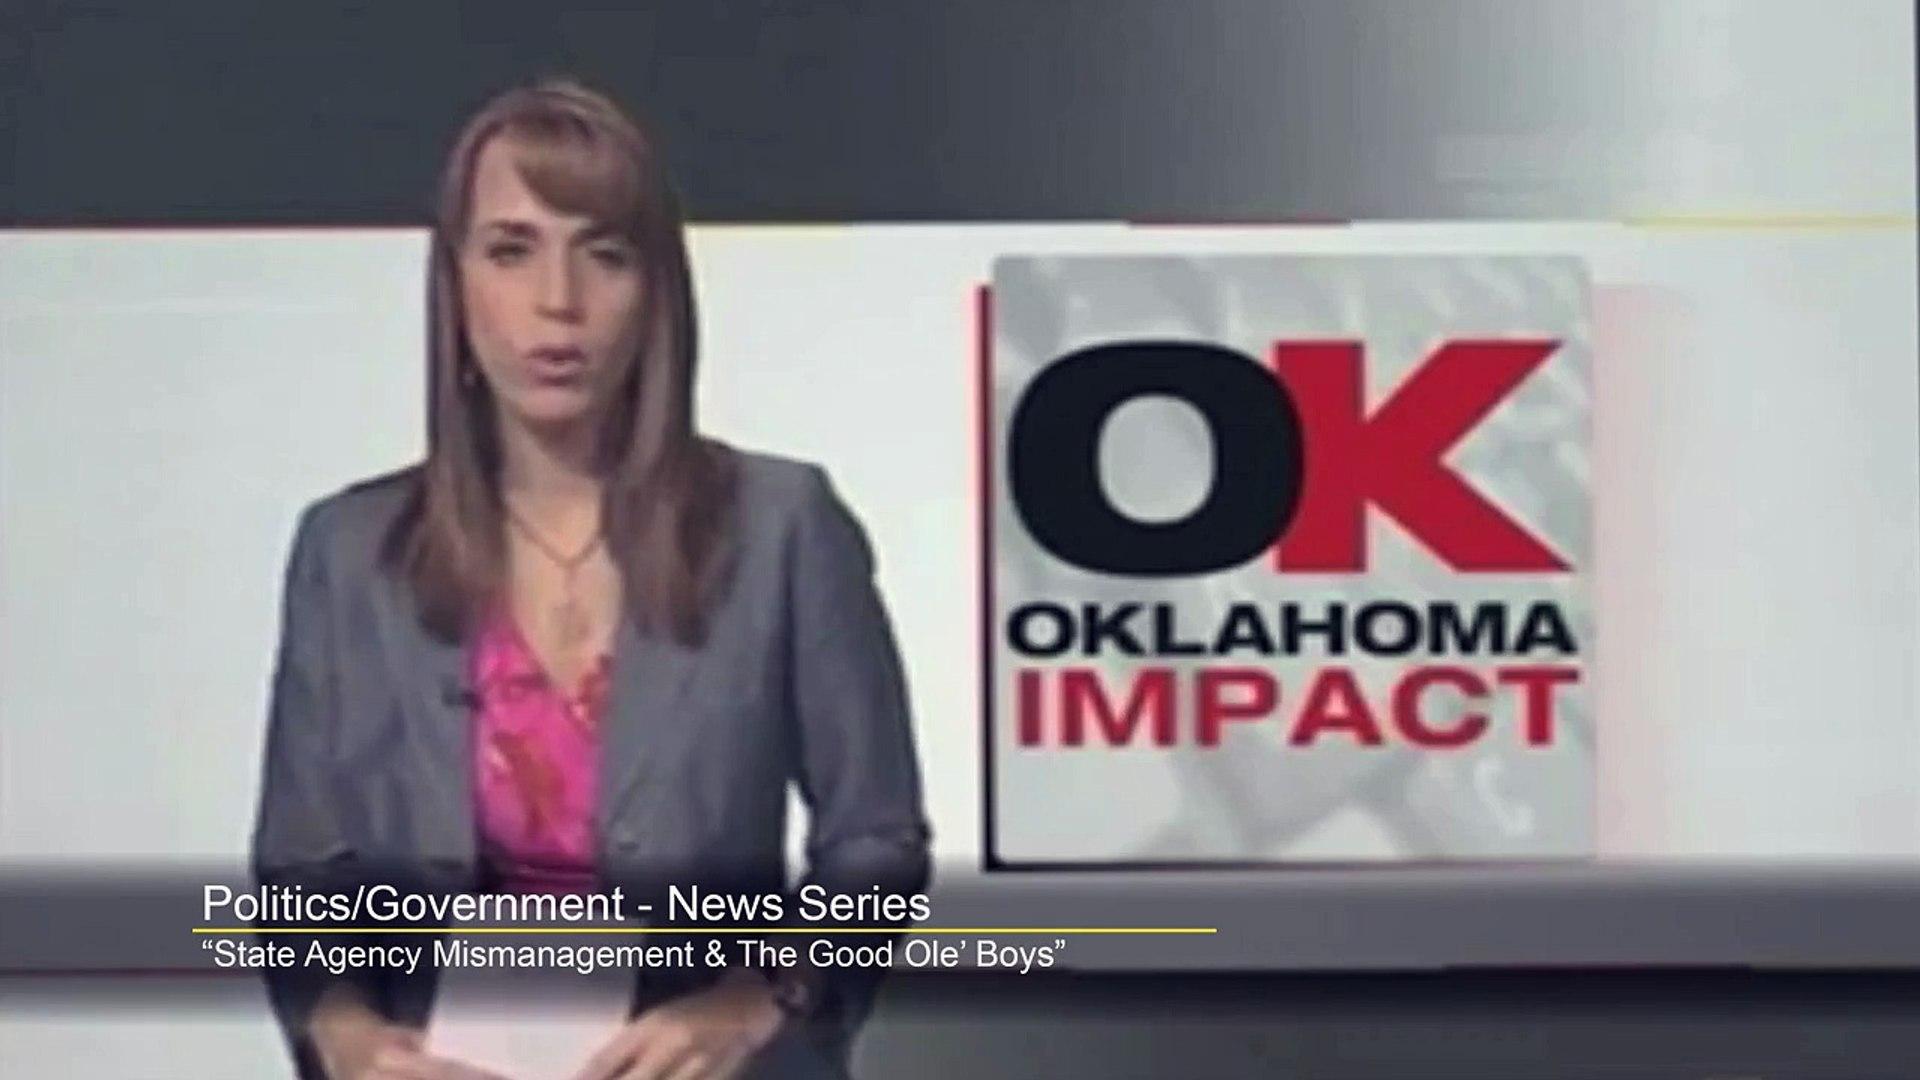 Politics/Government - News Series -